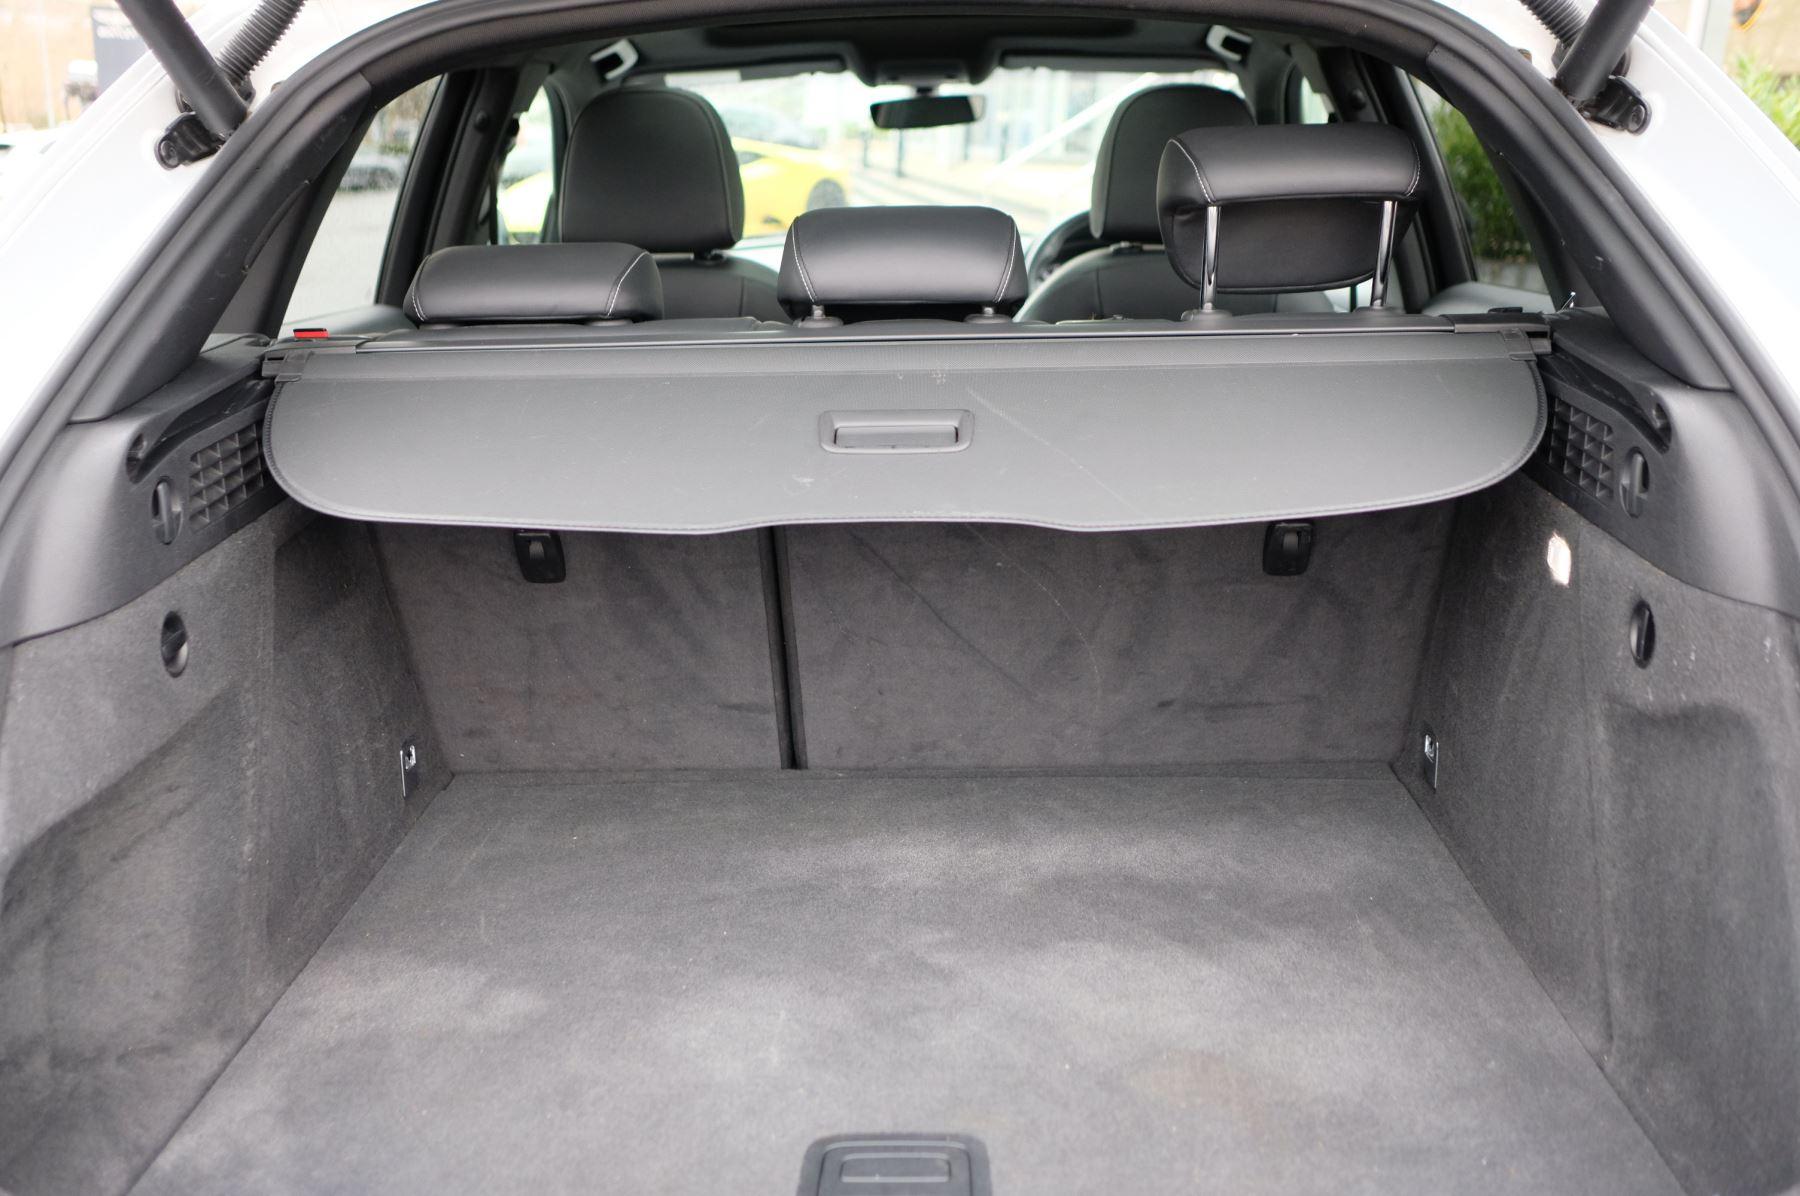 Audi Q3 2.0T FSI Quattro Black Edition 5dr S Tronic - Panoramic glass sunroof image 15